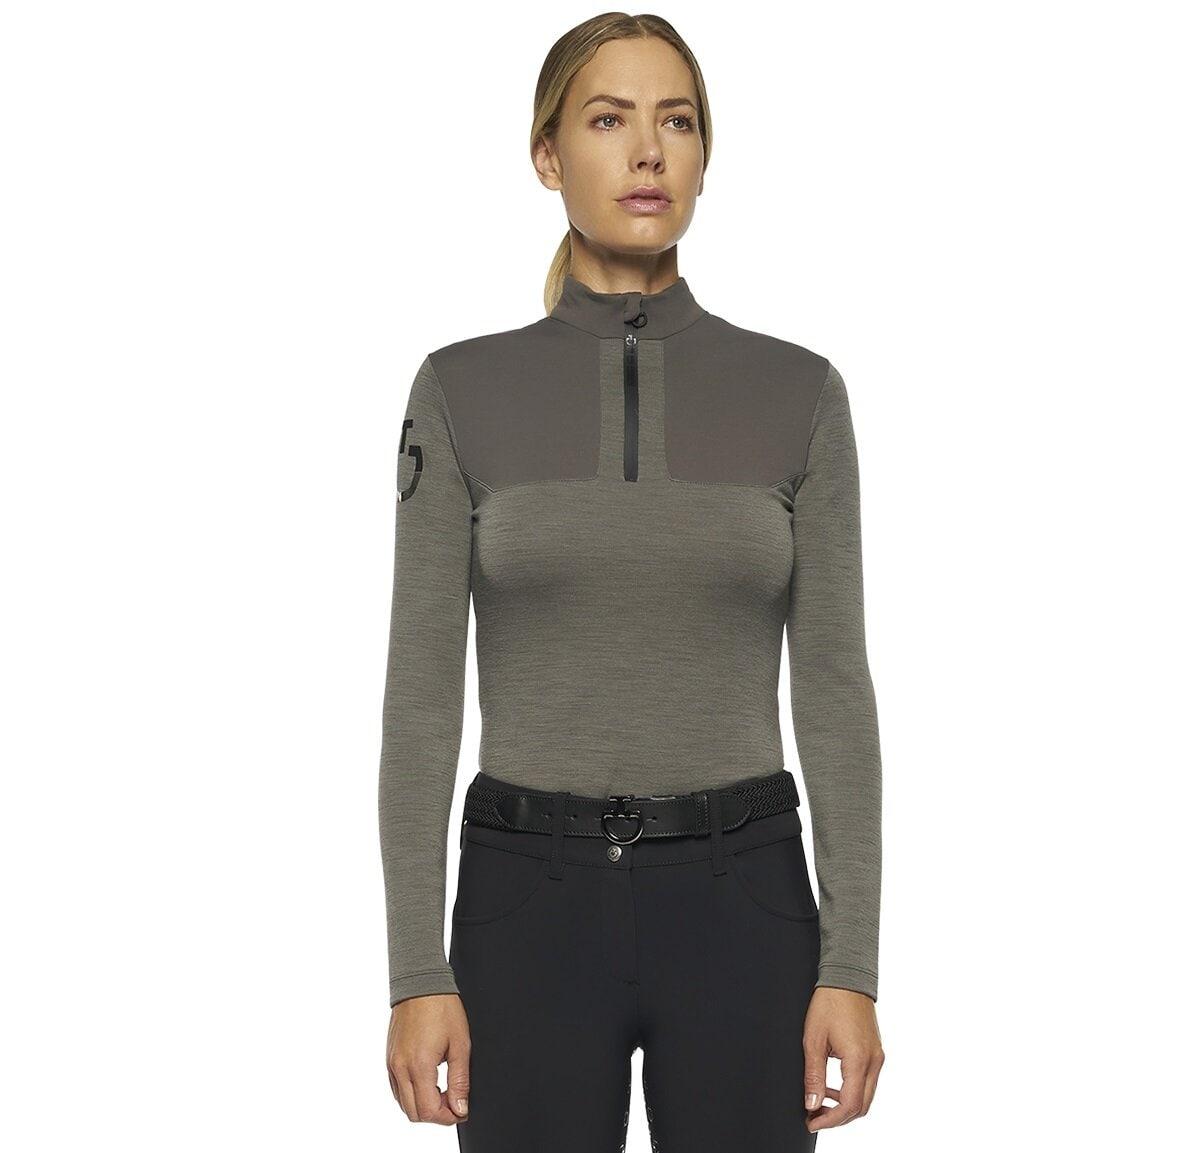 Tech Wool CT Laser Cut - Grå